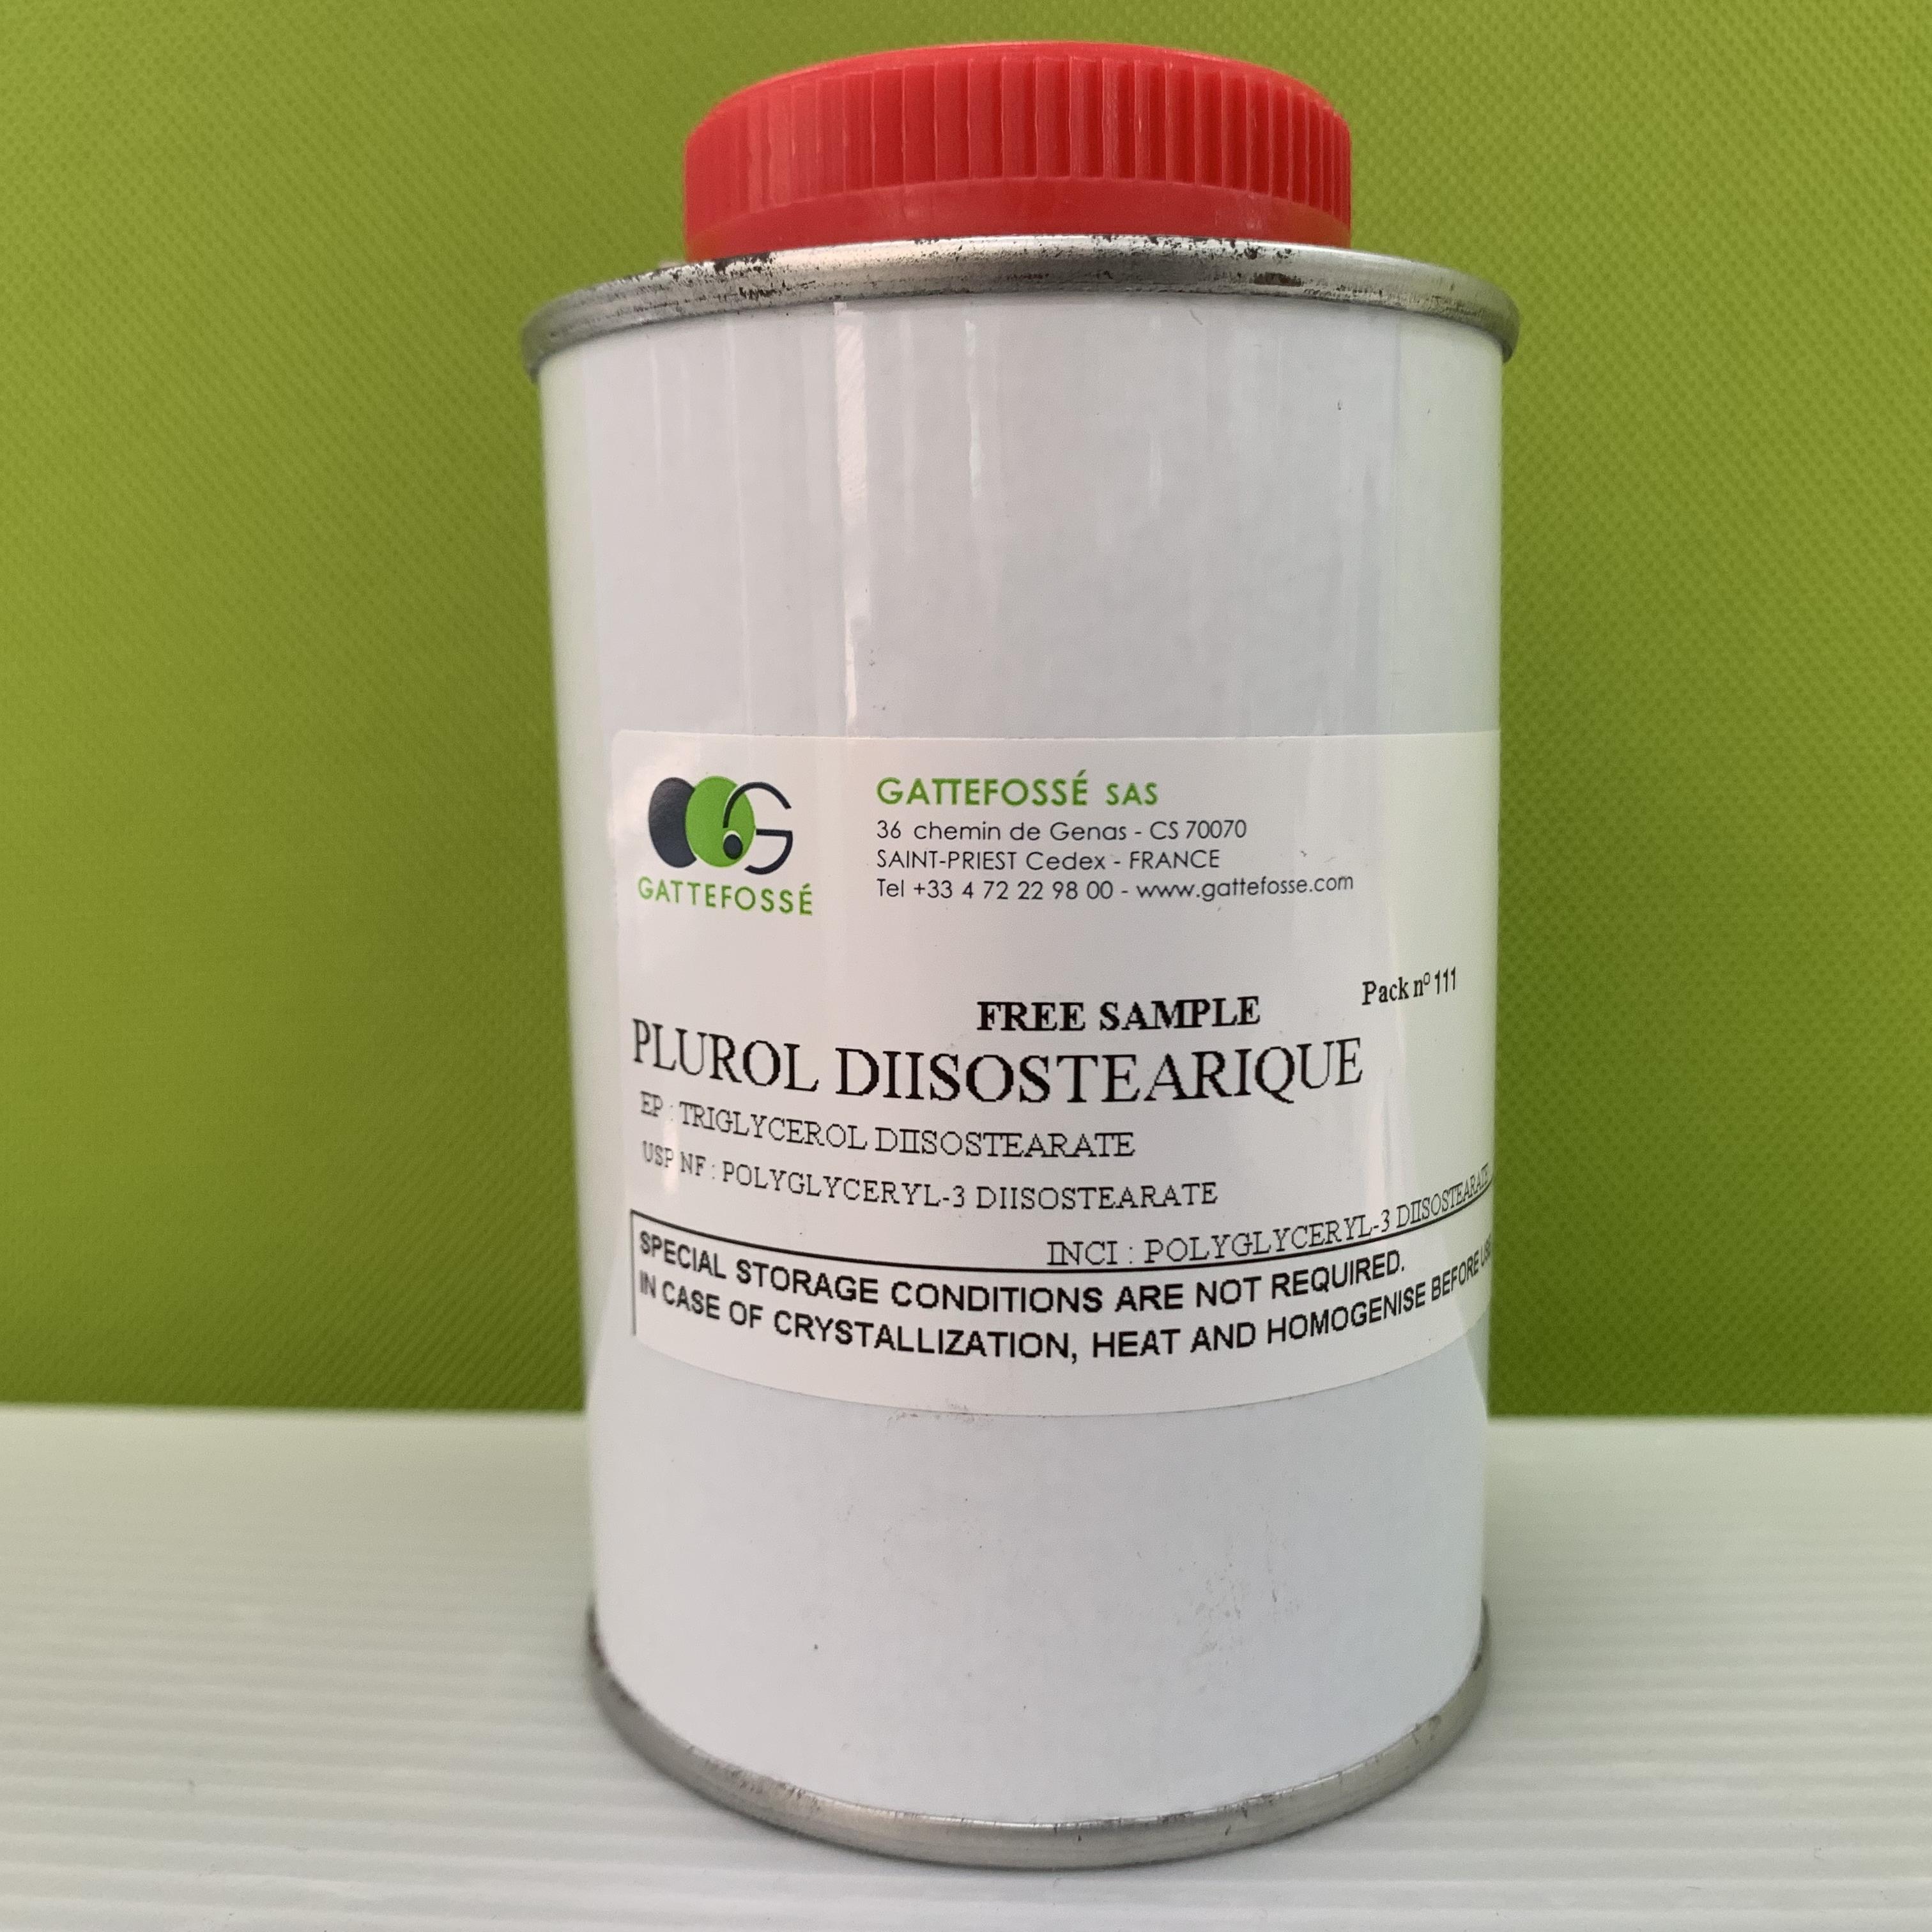 PLUROL DIISOSTEARIQUE 聚甘油-3双异硬脂酸酯